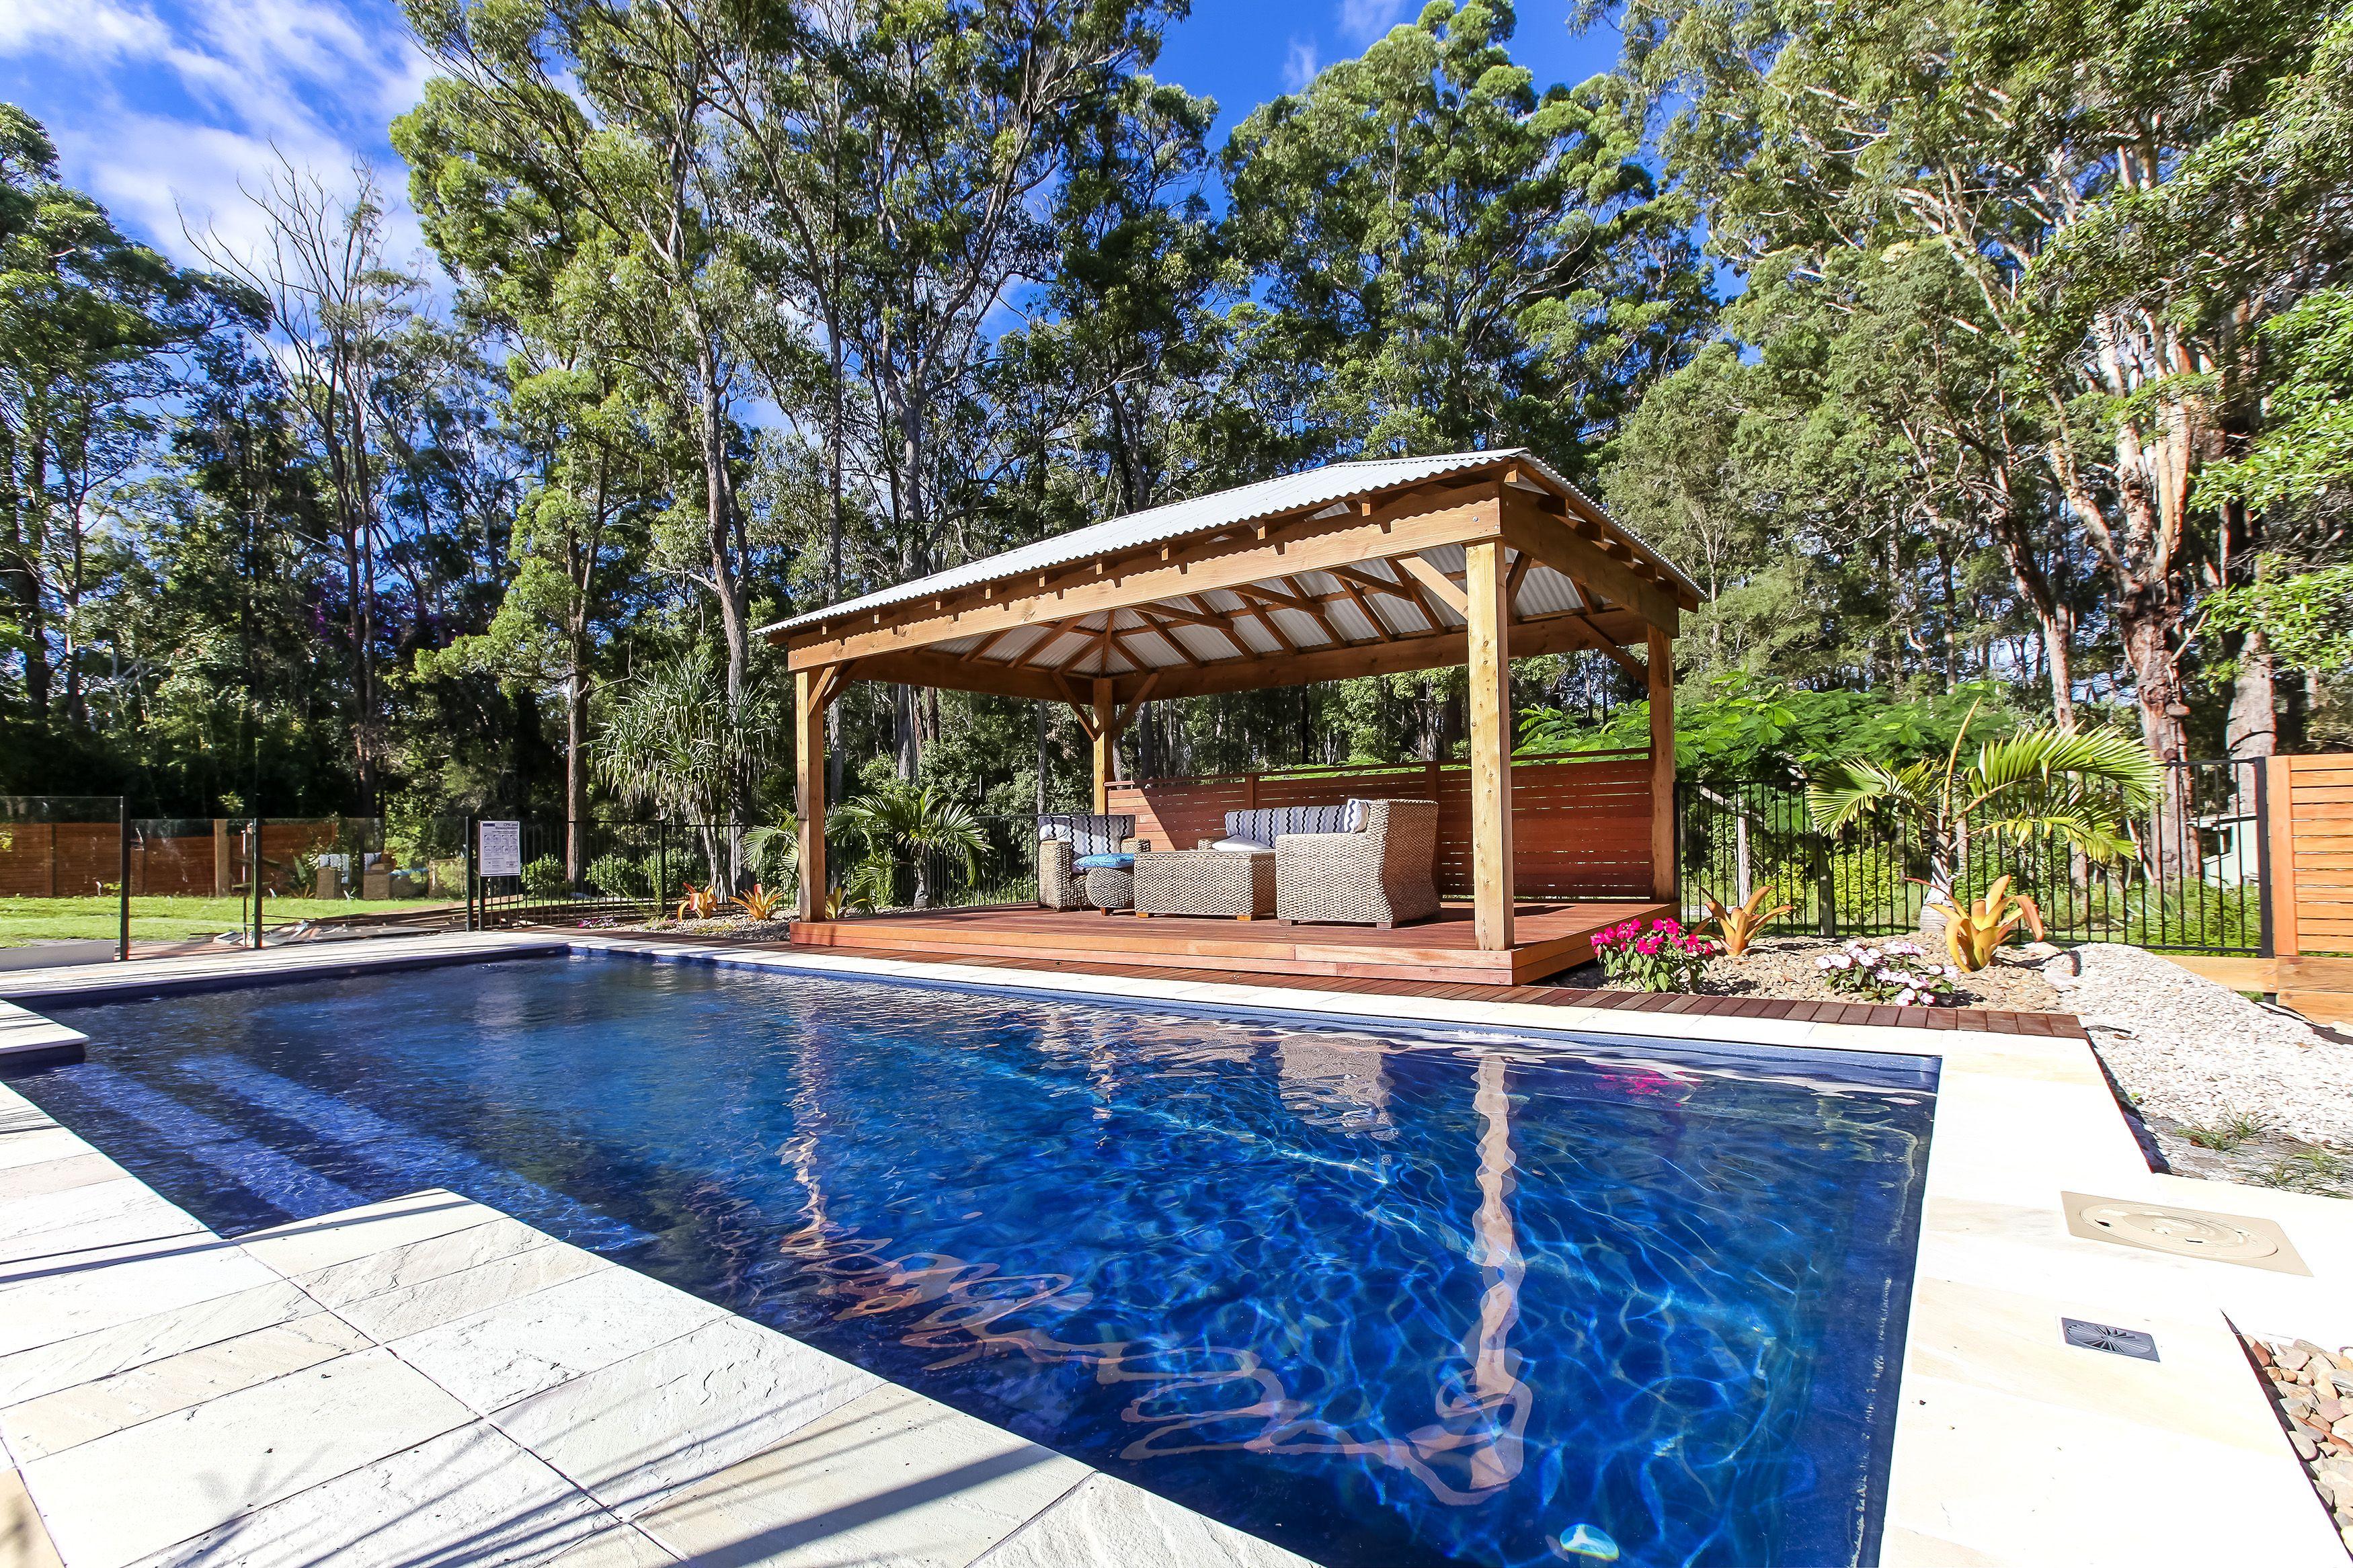 Madeira By Narellan Pools: Narellan Pools Sunshine Coast- Symphony Pool In Blue